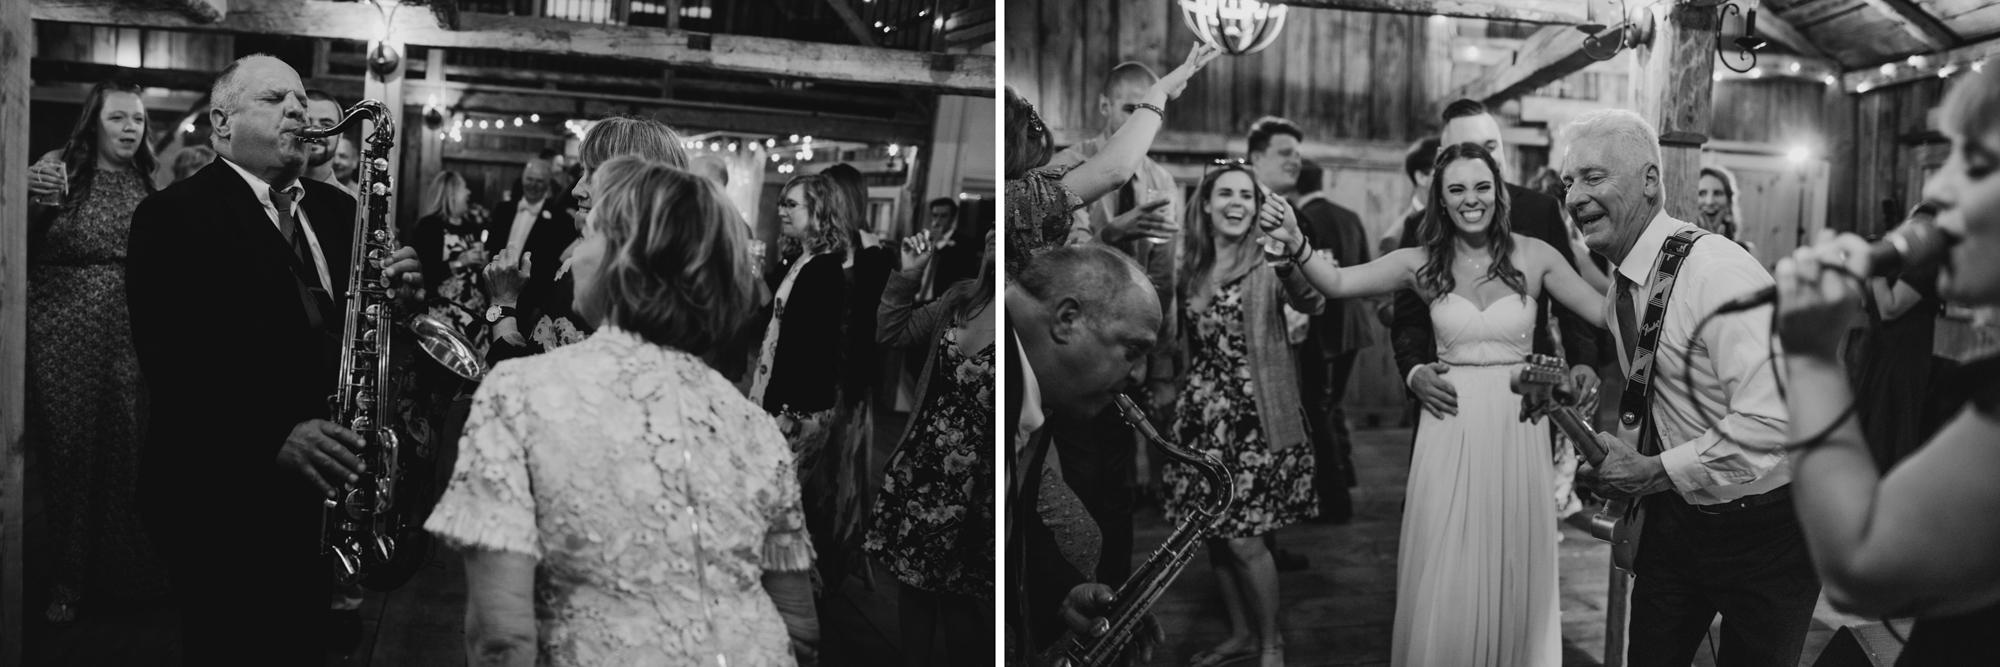 Livewell_Farm_wedding_Harpswell_maine_Meghan_Jim_026.jpg